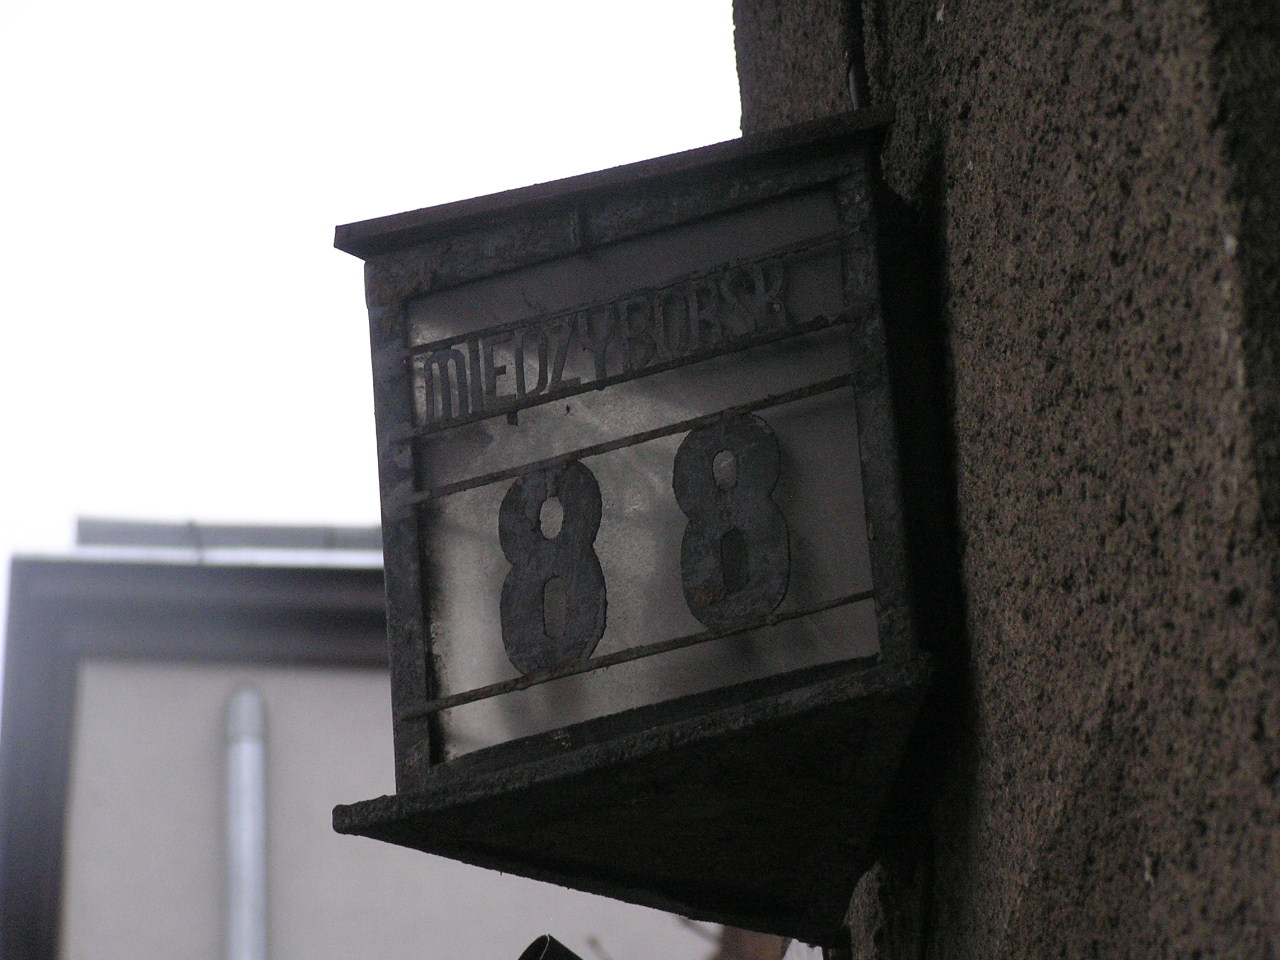 Latarenka adresowa - Międzyborska 88